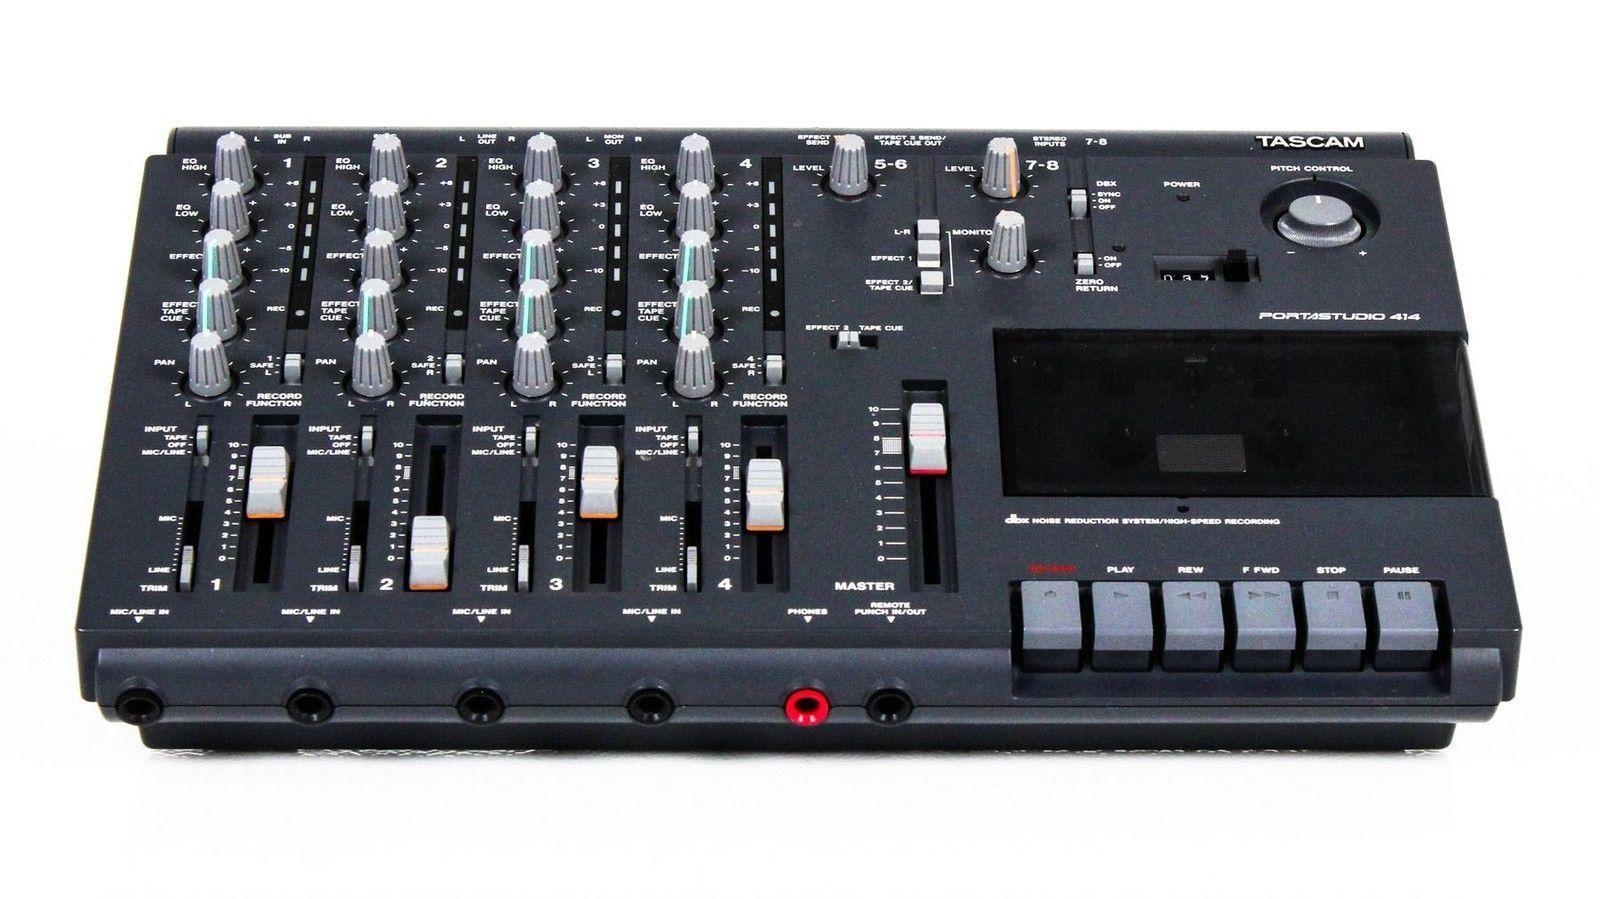 tascam-414-portastudio-track-cassette_1_077bb28b21a2bf46712706b03a9ba643.jpg